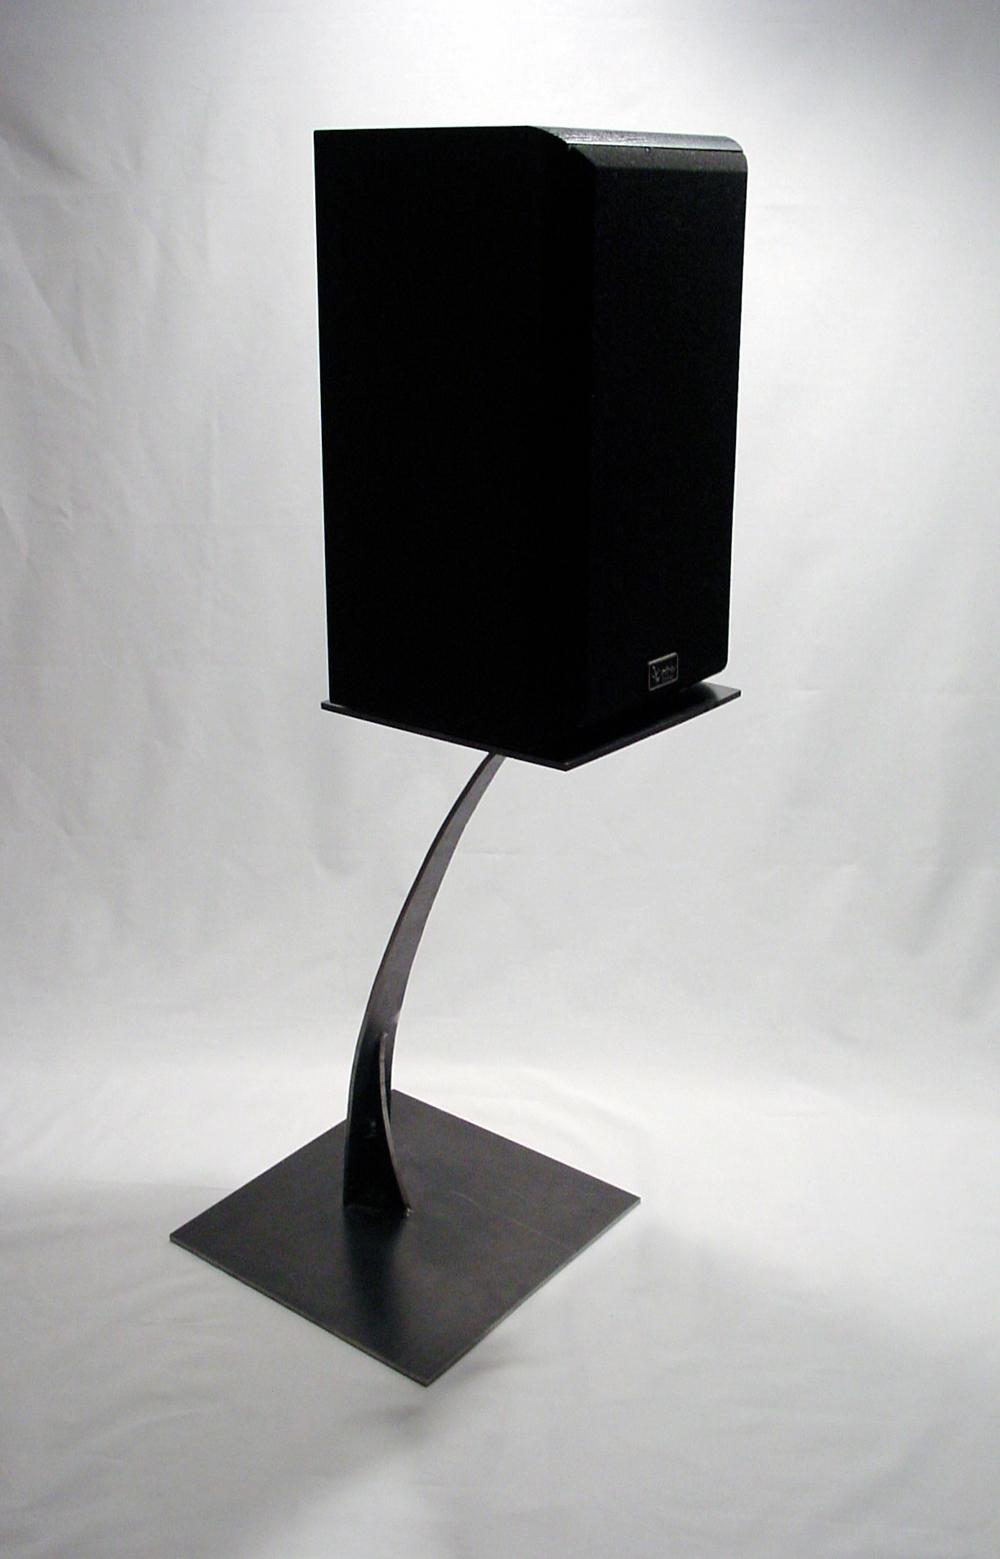 speakerstand-w-speaker.jpg